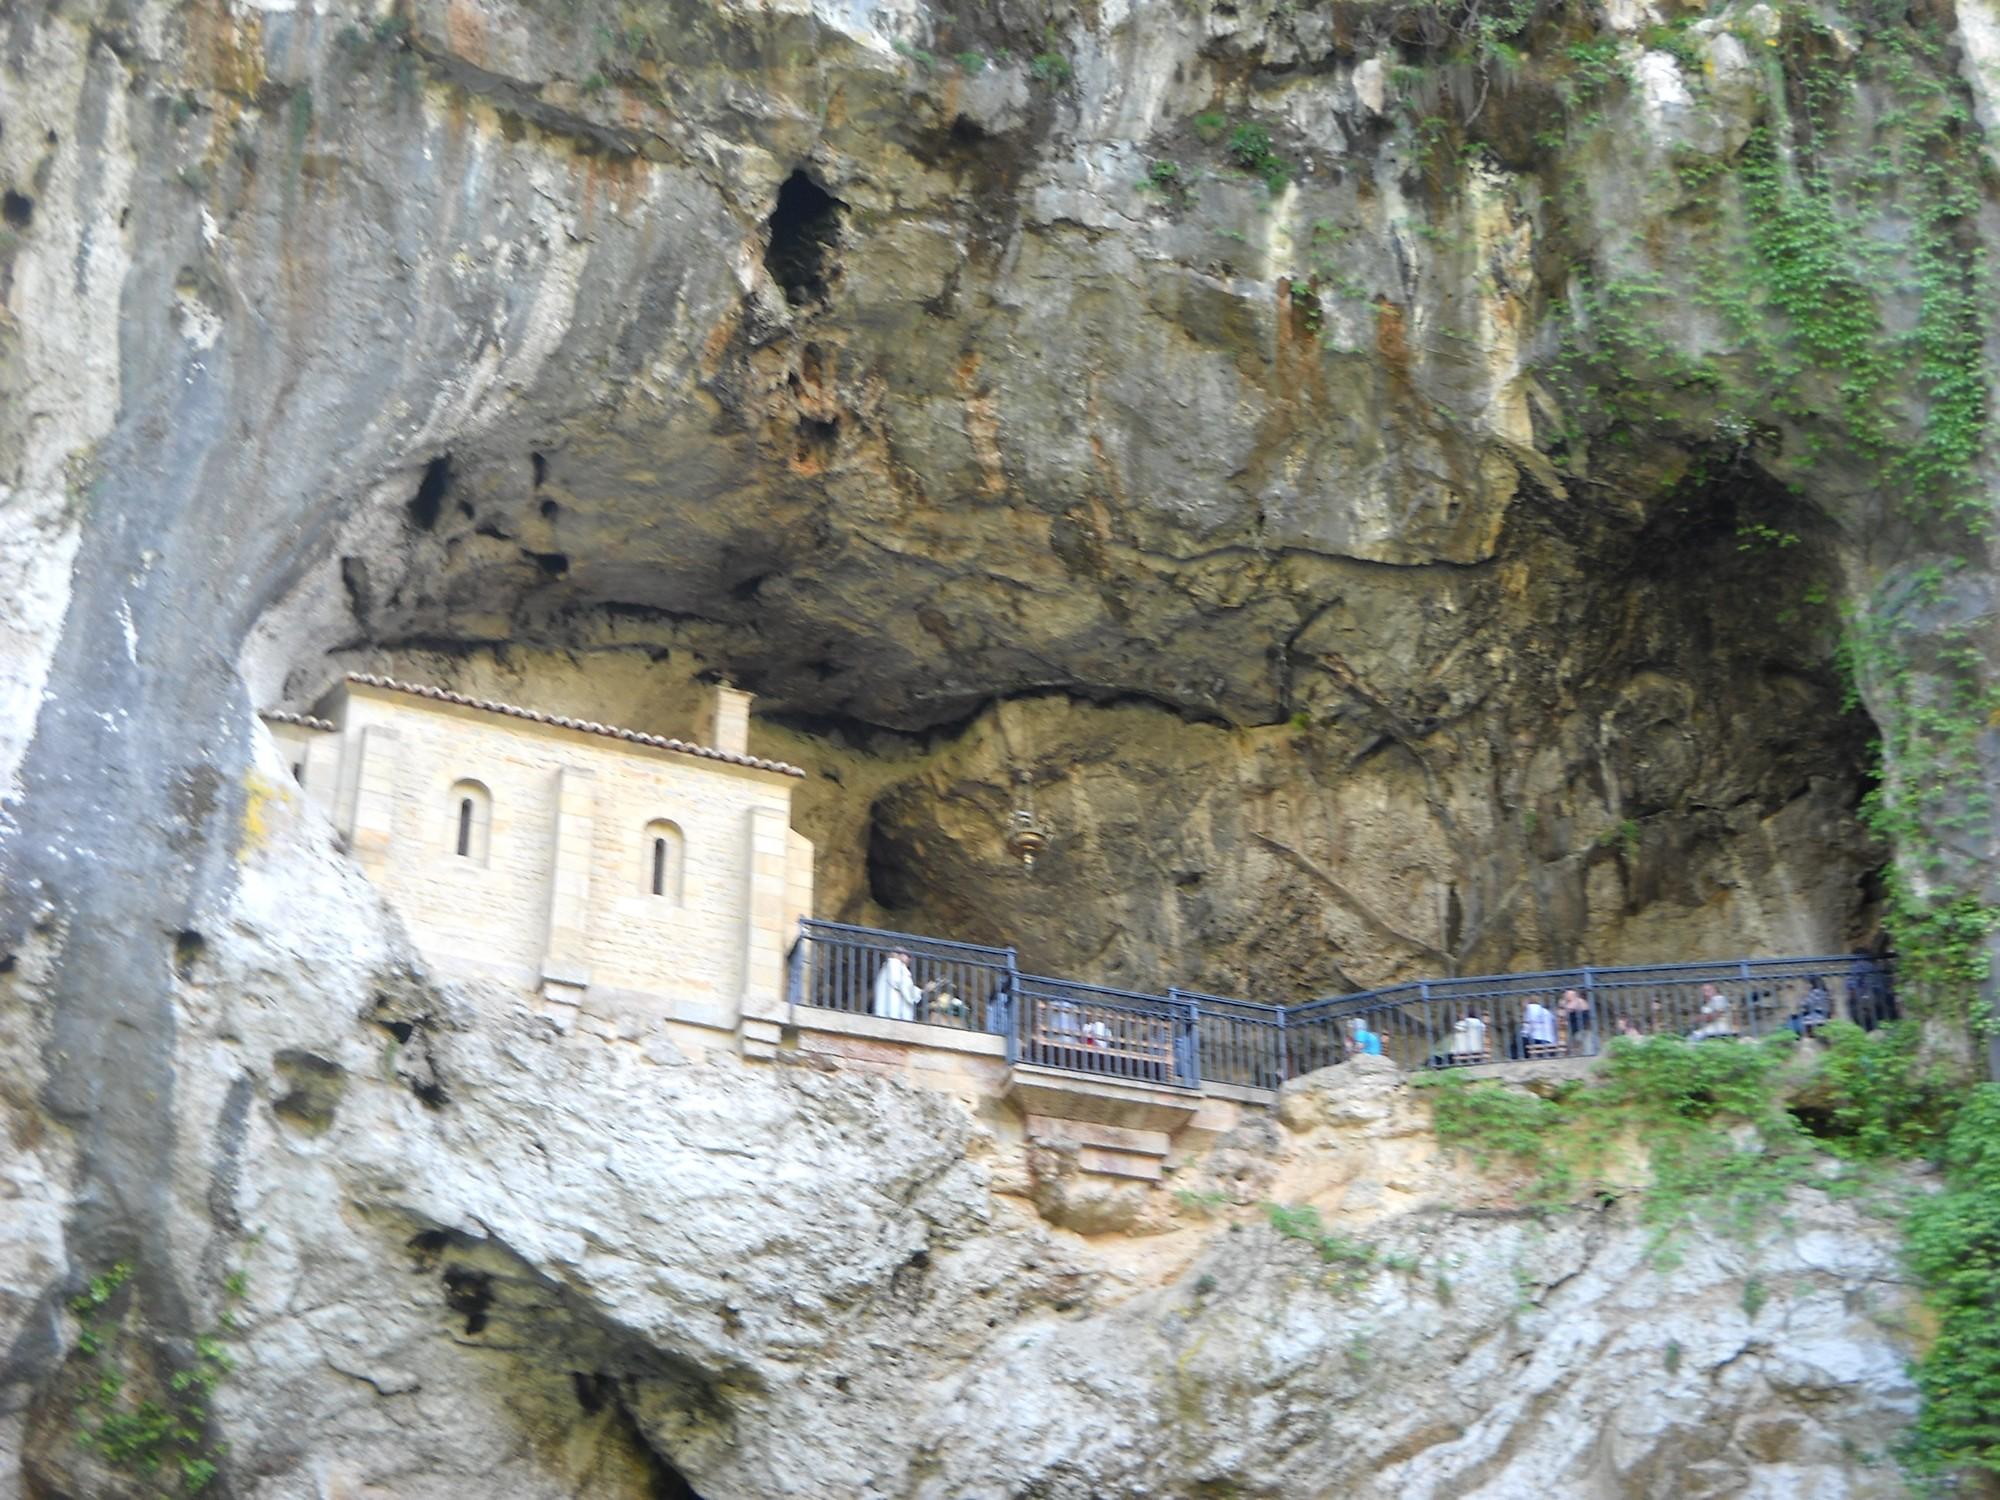 Casas rurales cangas de on s turismo rural asturias for Hoteles rurales en asturias con piscina